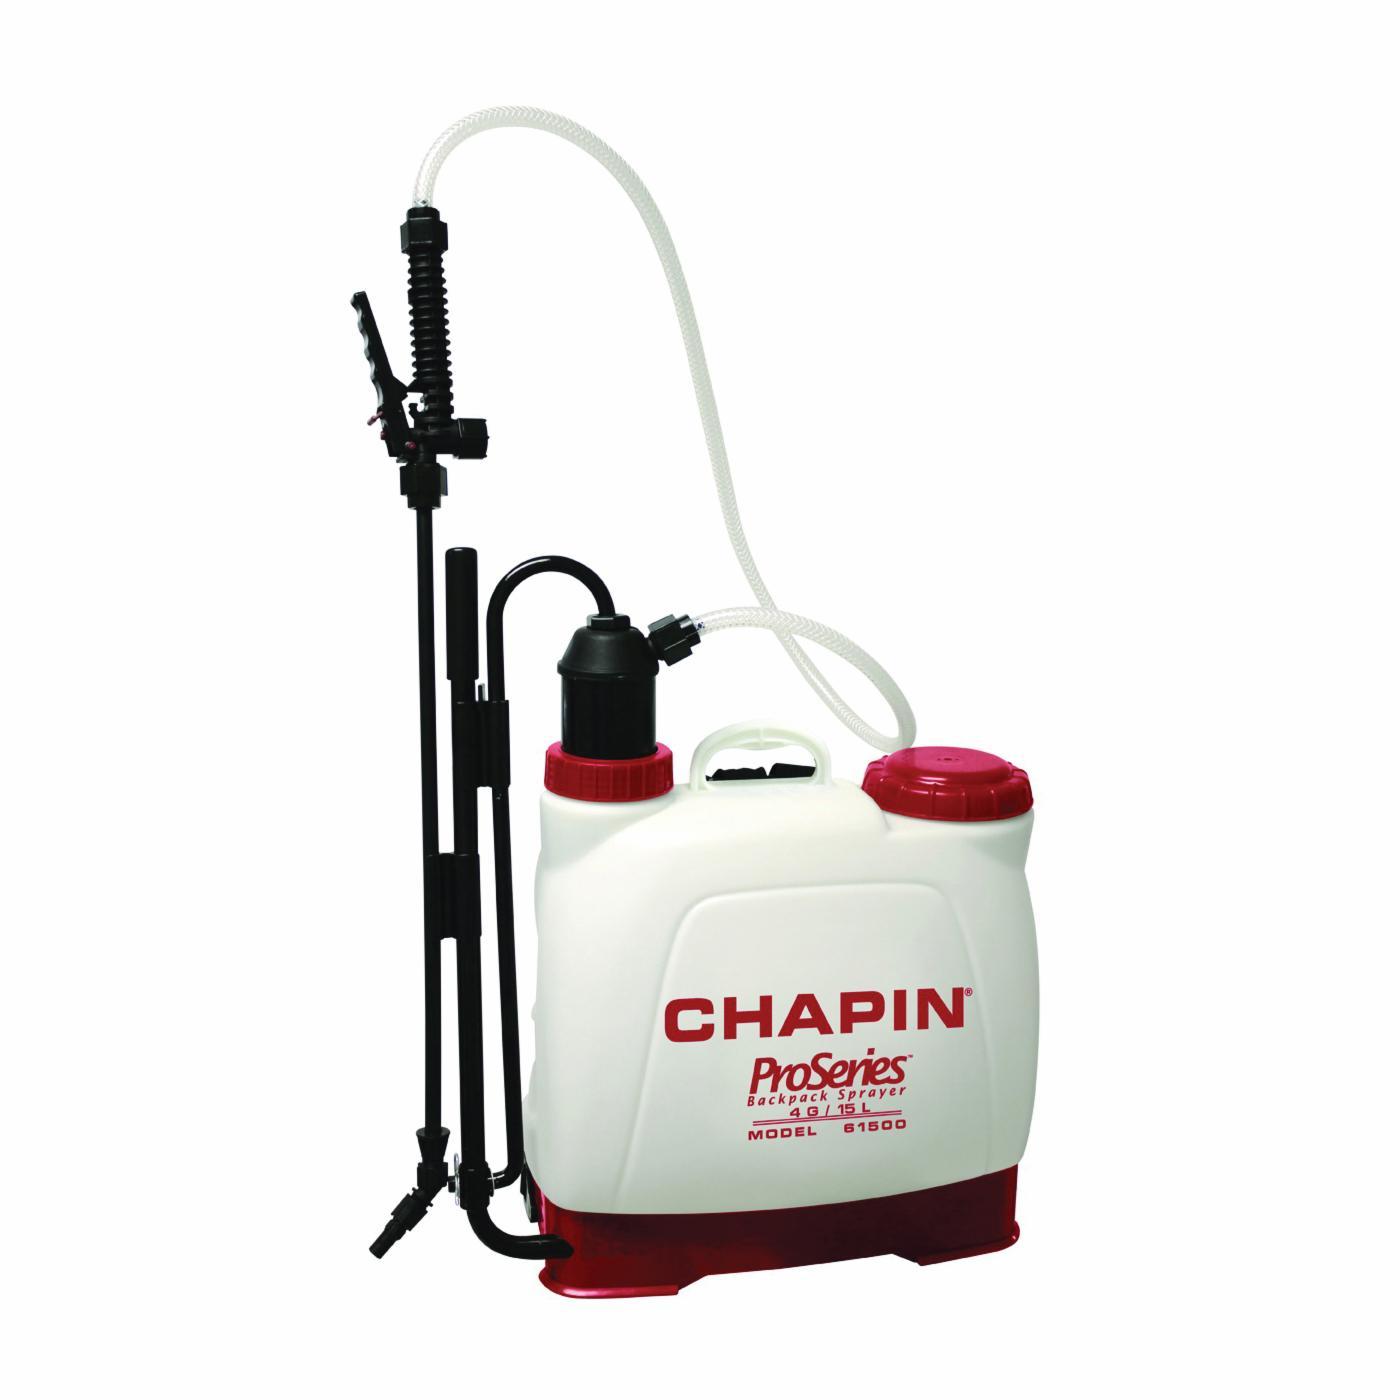 CHAPIN MFG 61500